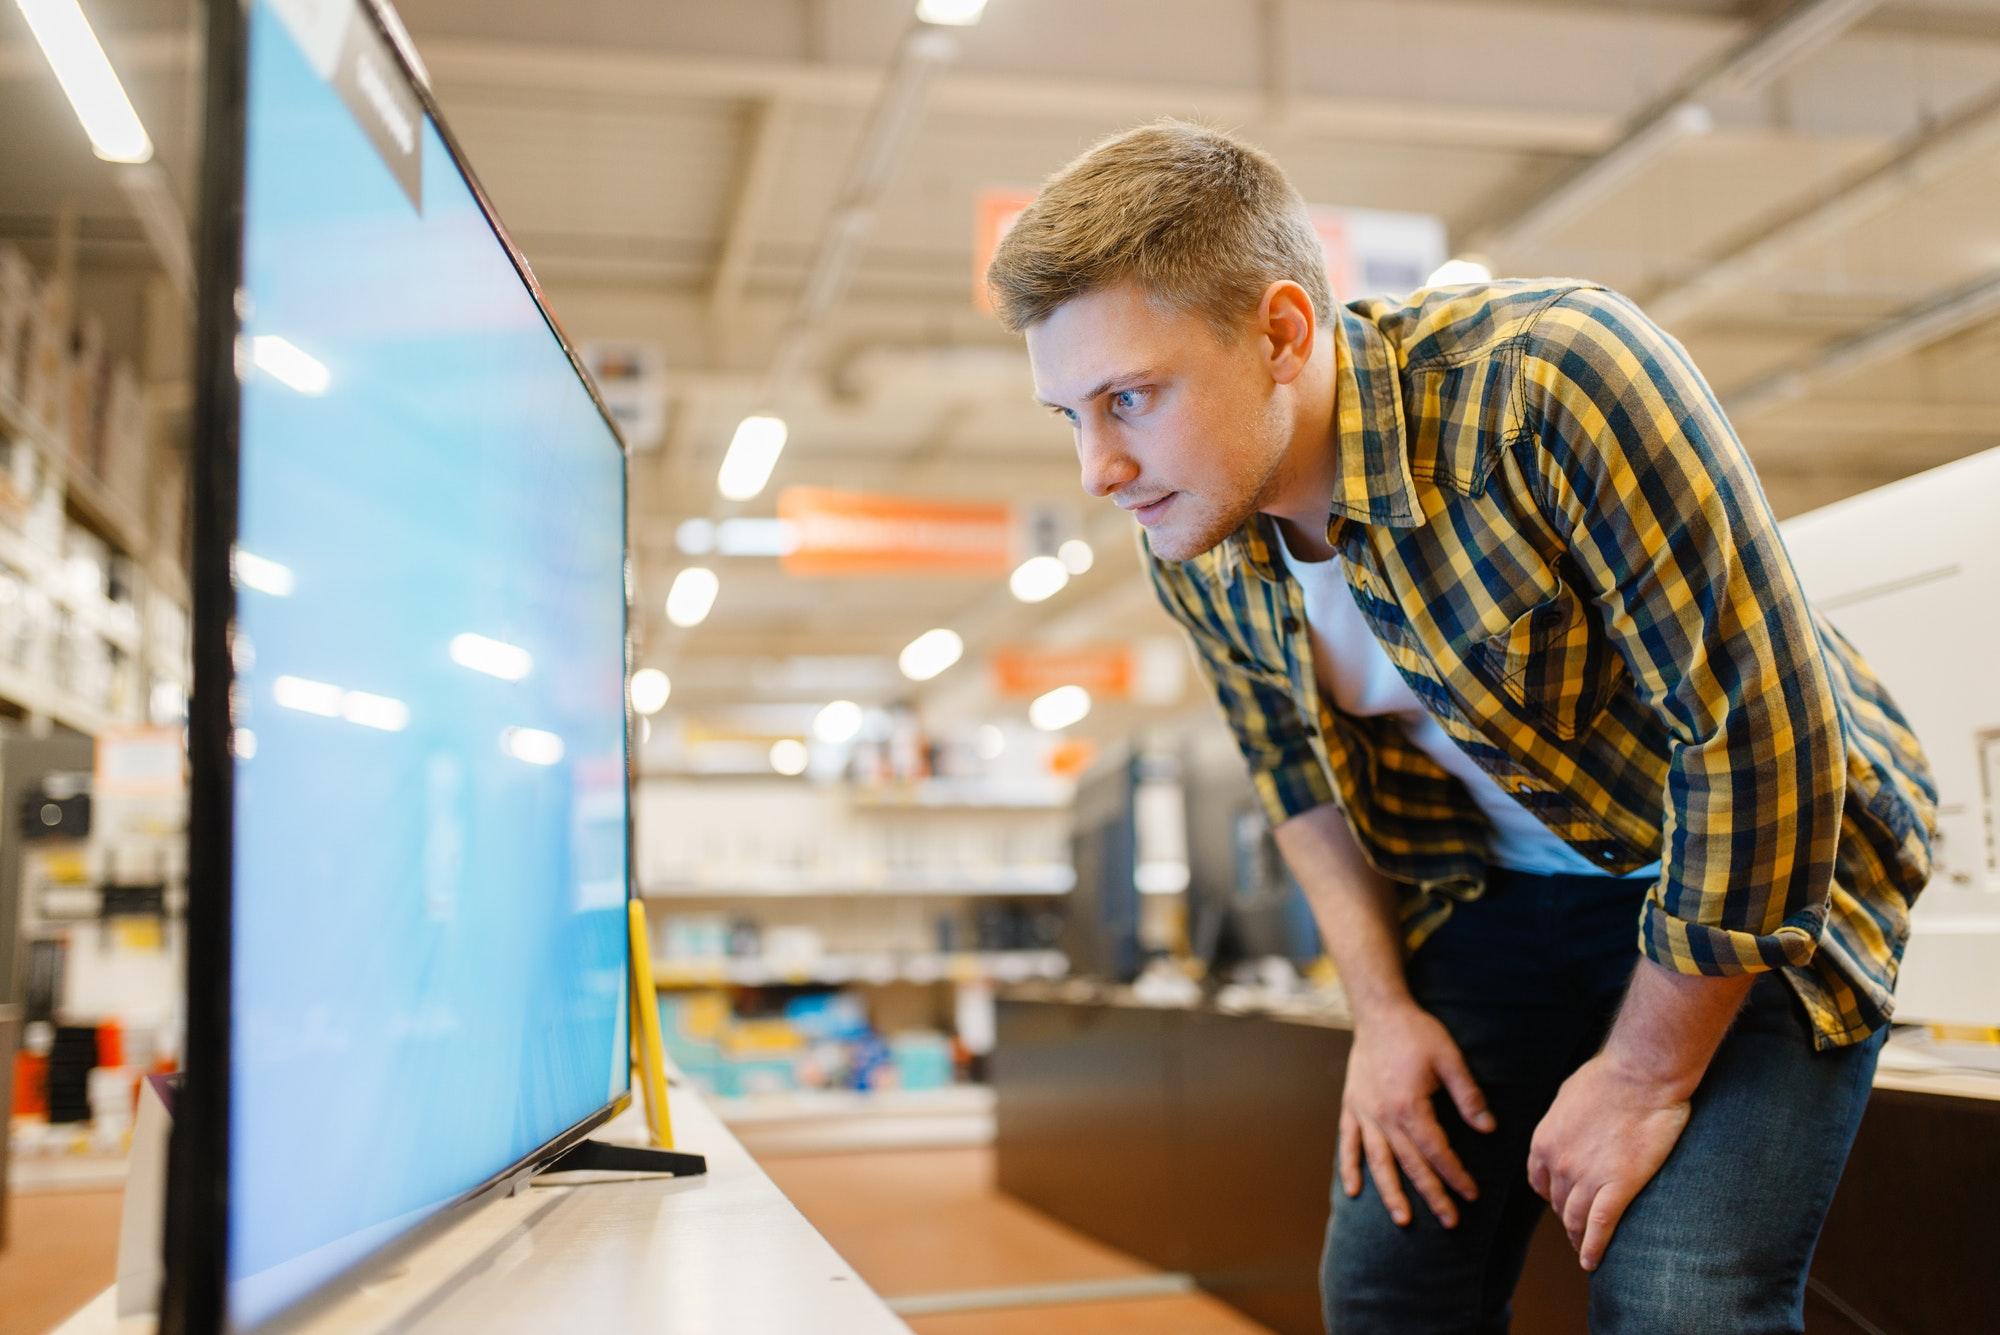 Man choosing TV in electronics store